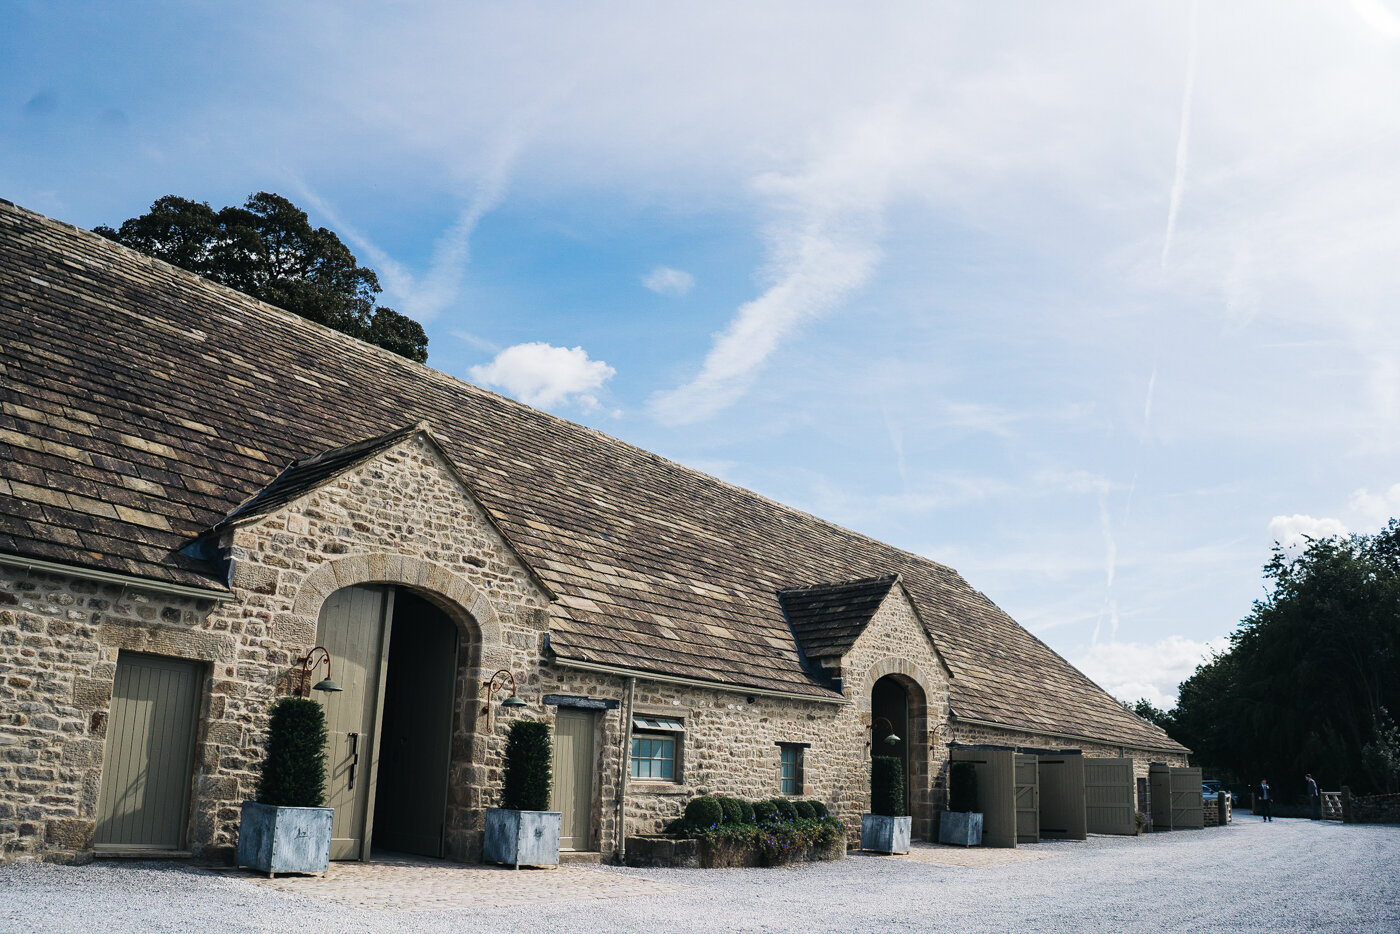 tithe-barn-bolton-abbey-north-yorkshire-cripps-wedding-photographer-creative-0015.jpg